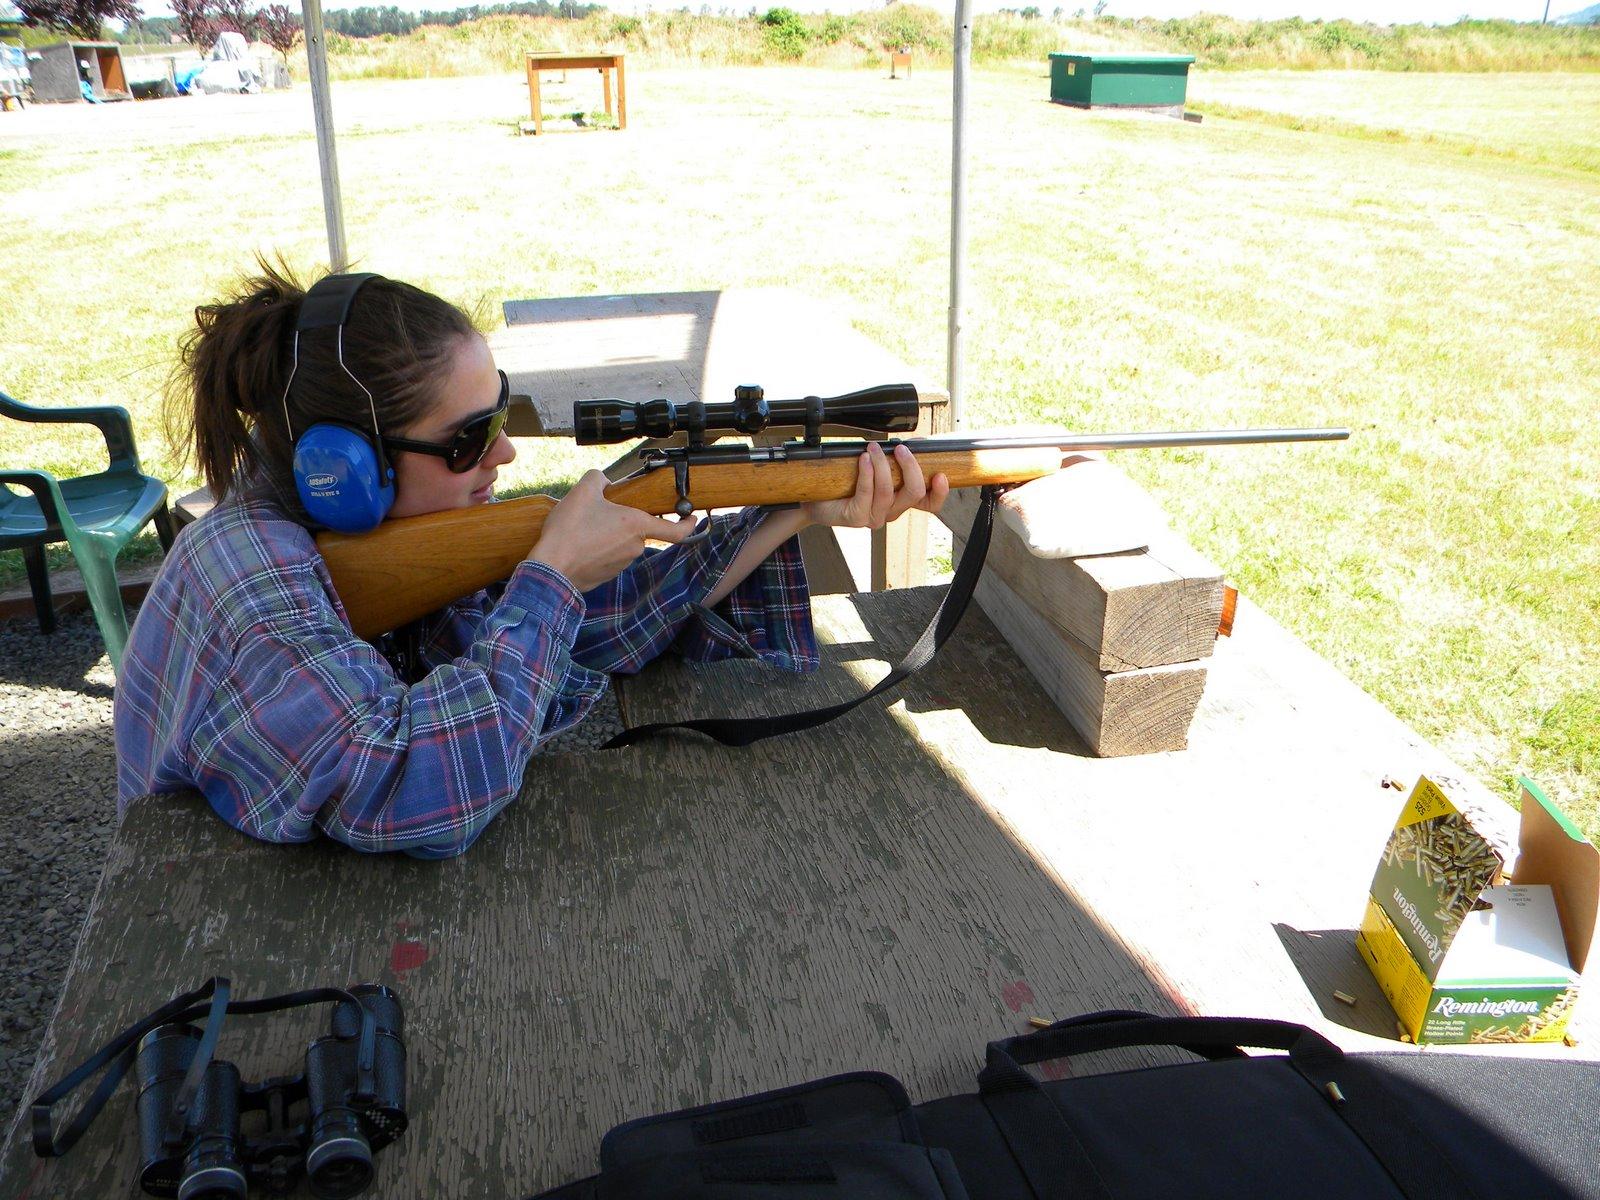 [Shooting+at+the+range]